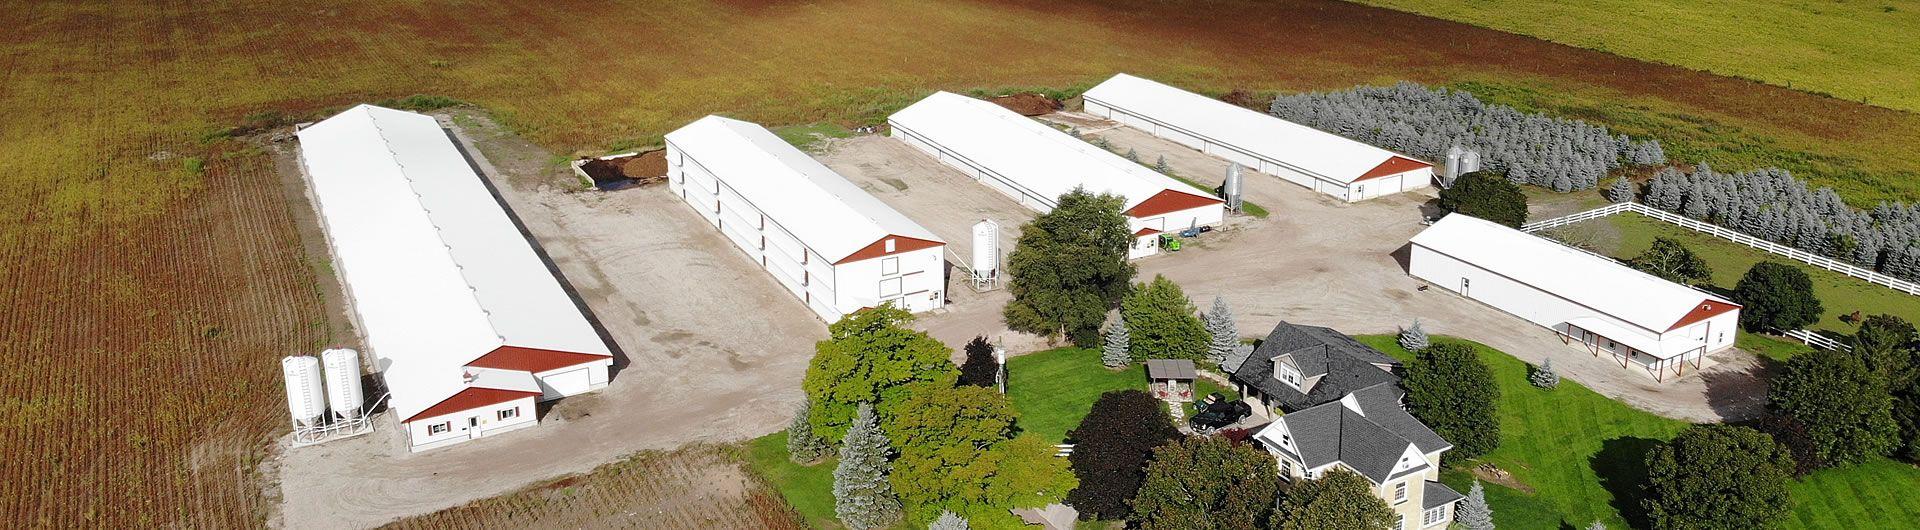 Aerial shot farm buildings